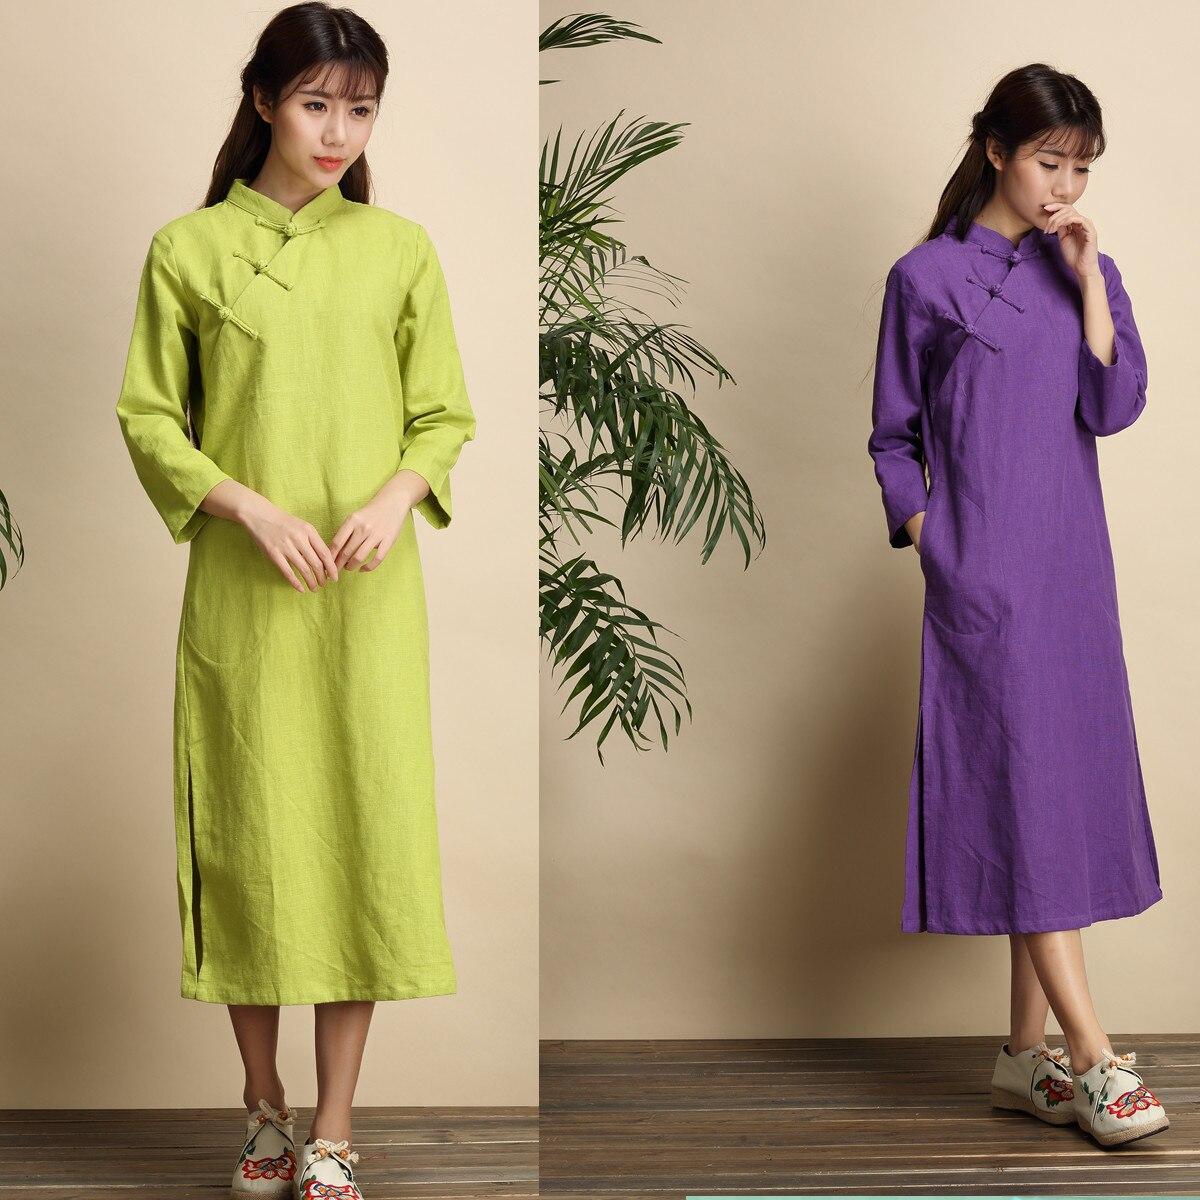 Stylewomens retrolock Neck,slimplatebuckle, longitud media, vestido cheongsam de manga de 9 puntos, traje de estilo nacional chino